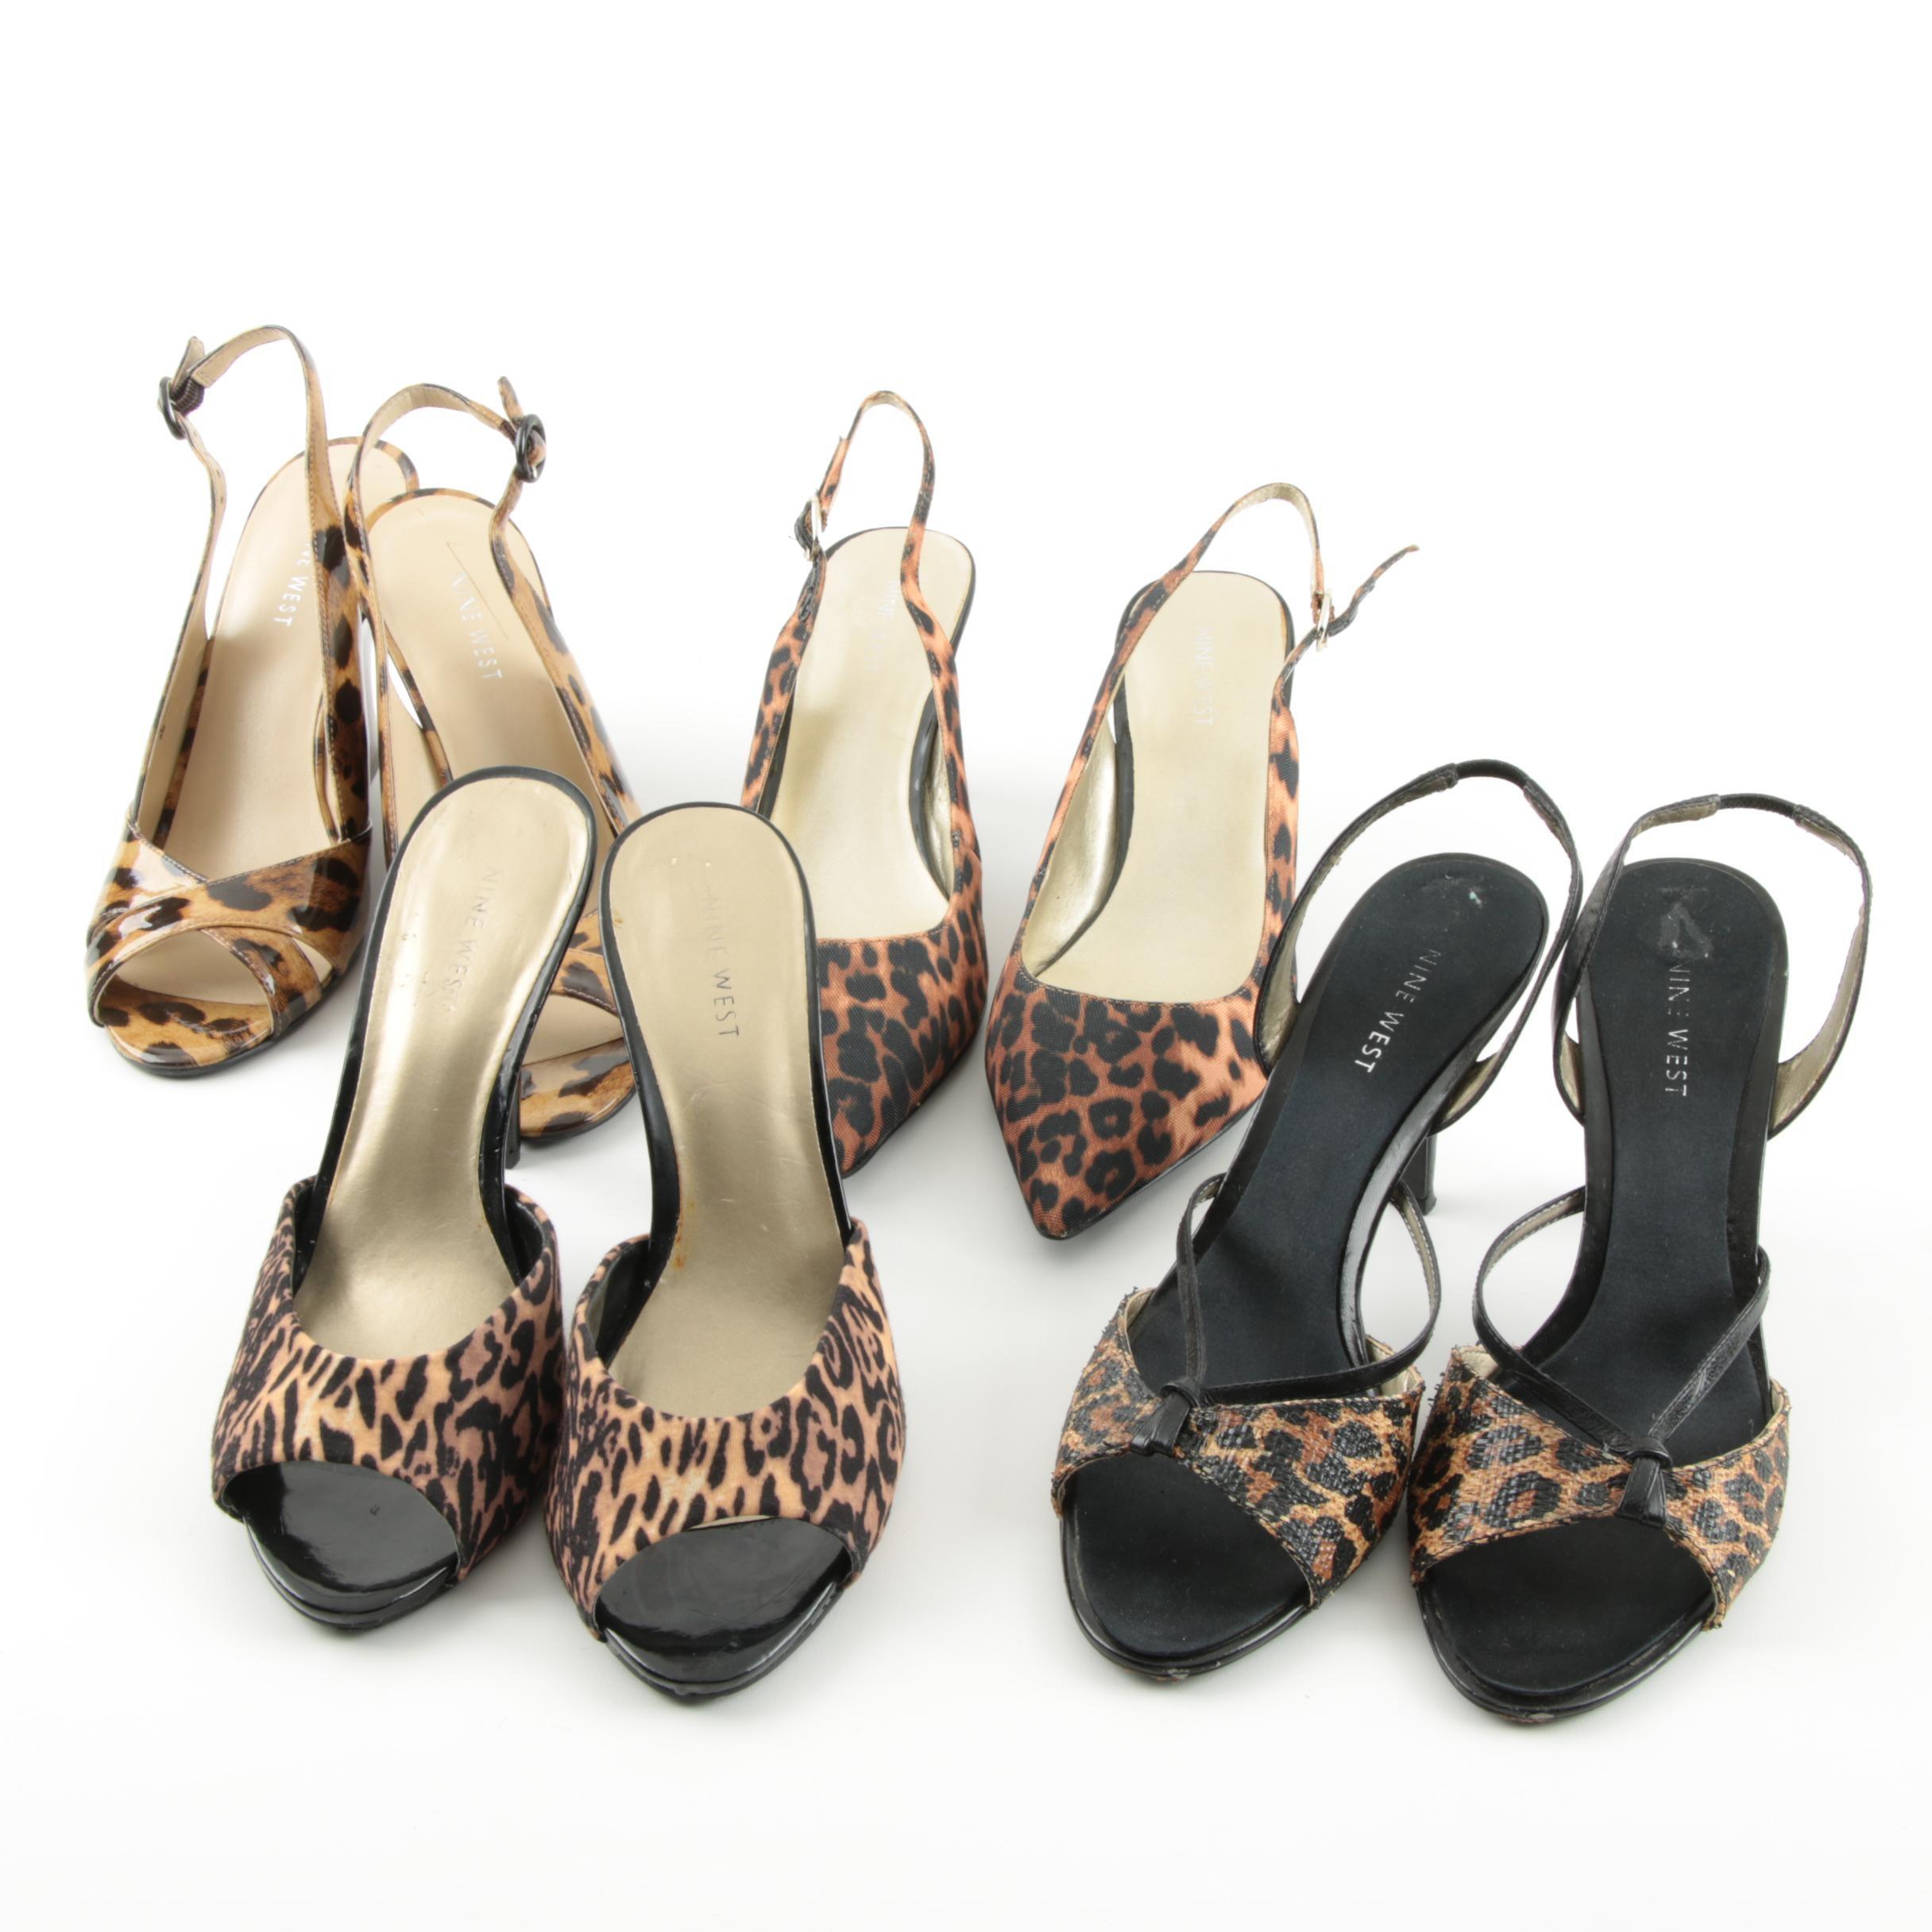 Women's Nine West Leopard Print Heels and Wedges